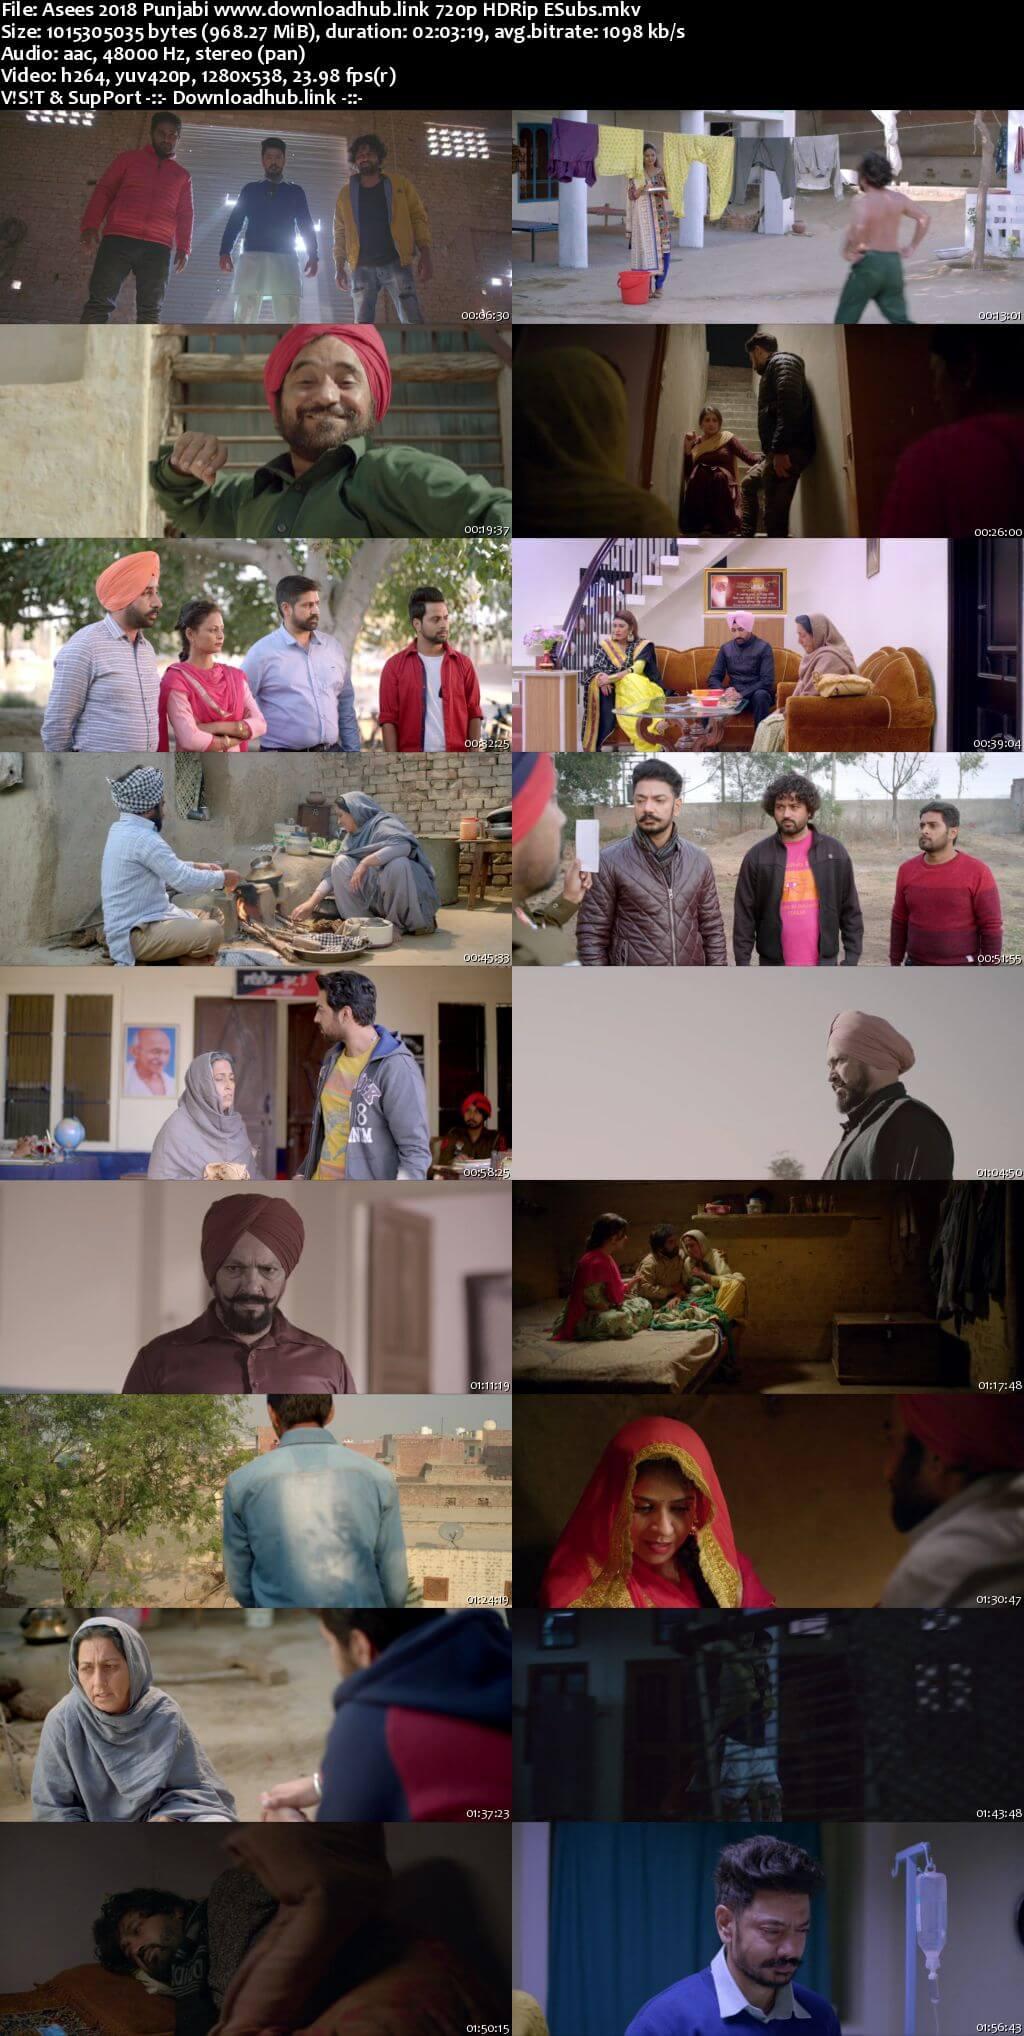 Asees 2018 Punjabi 720p HDRip ESubs